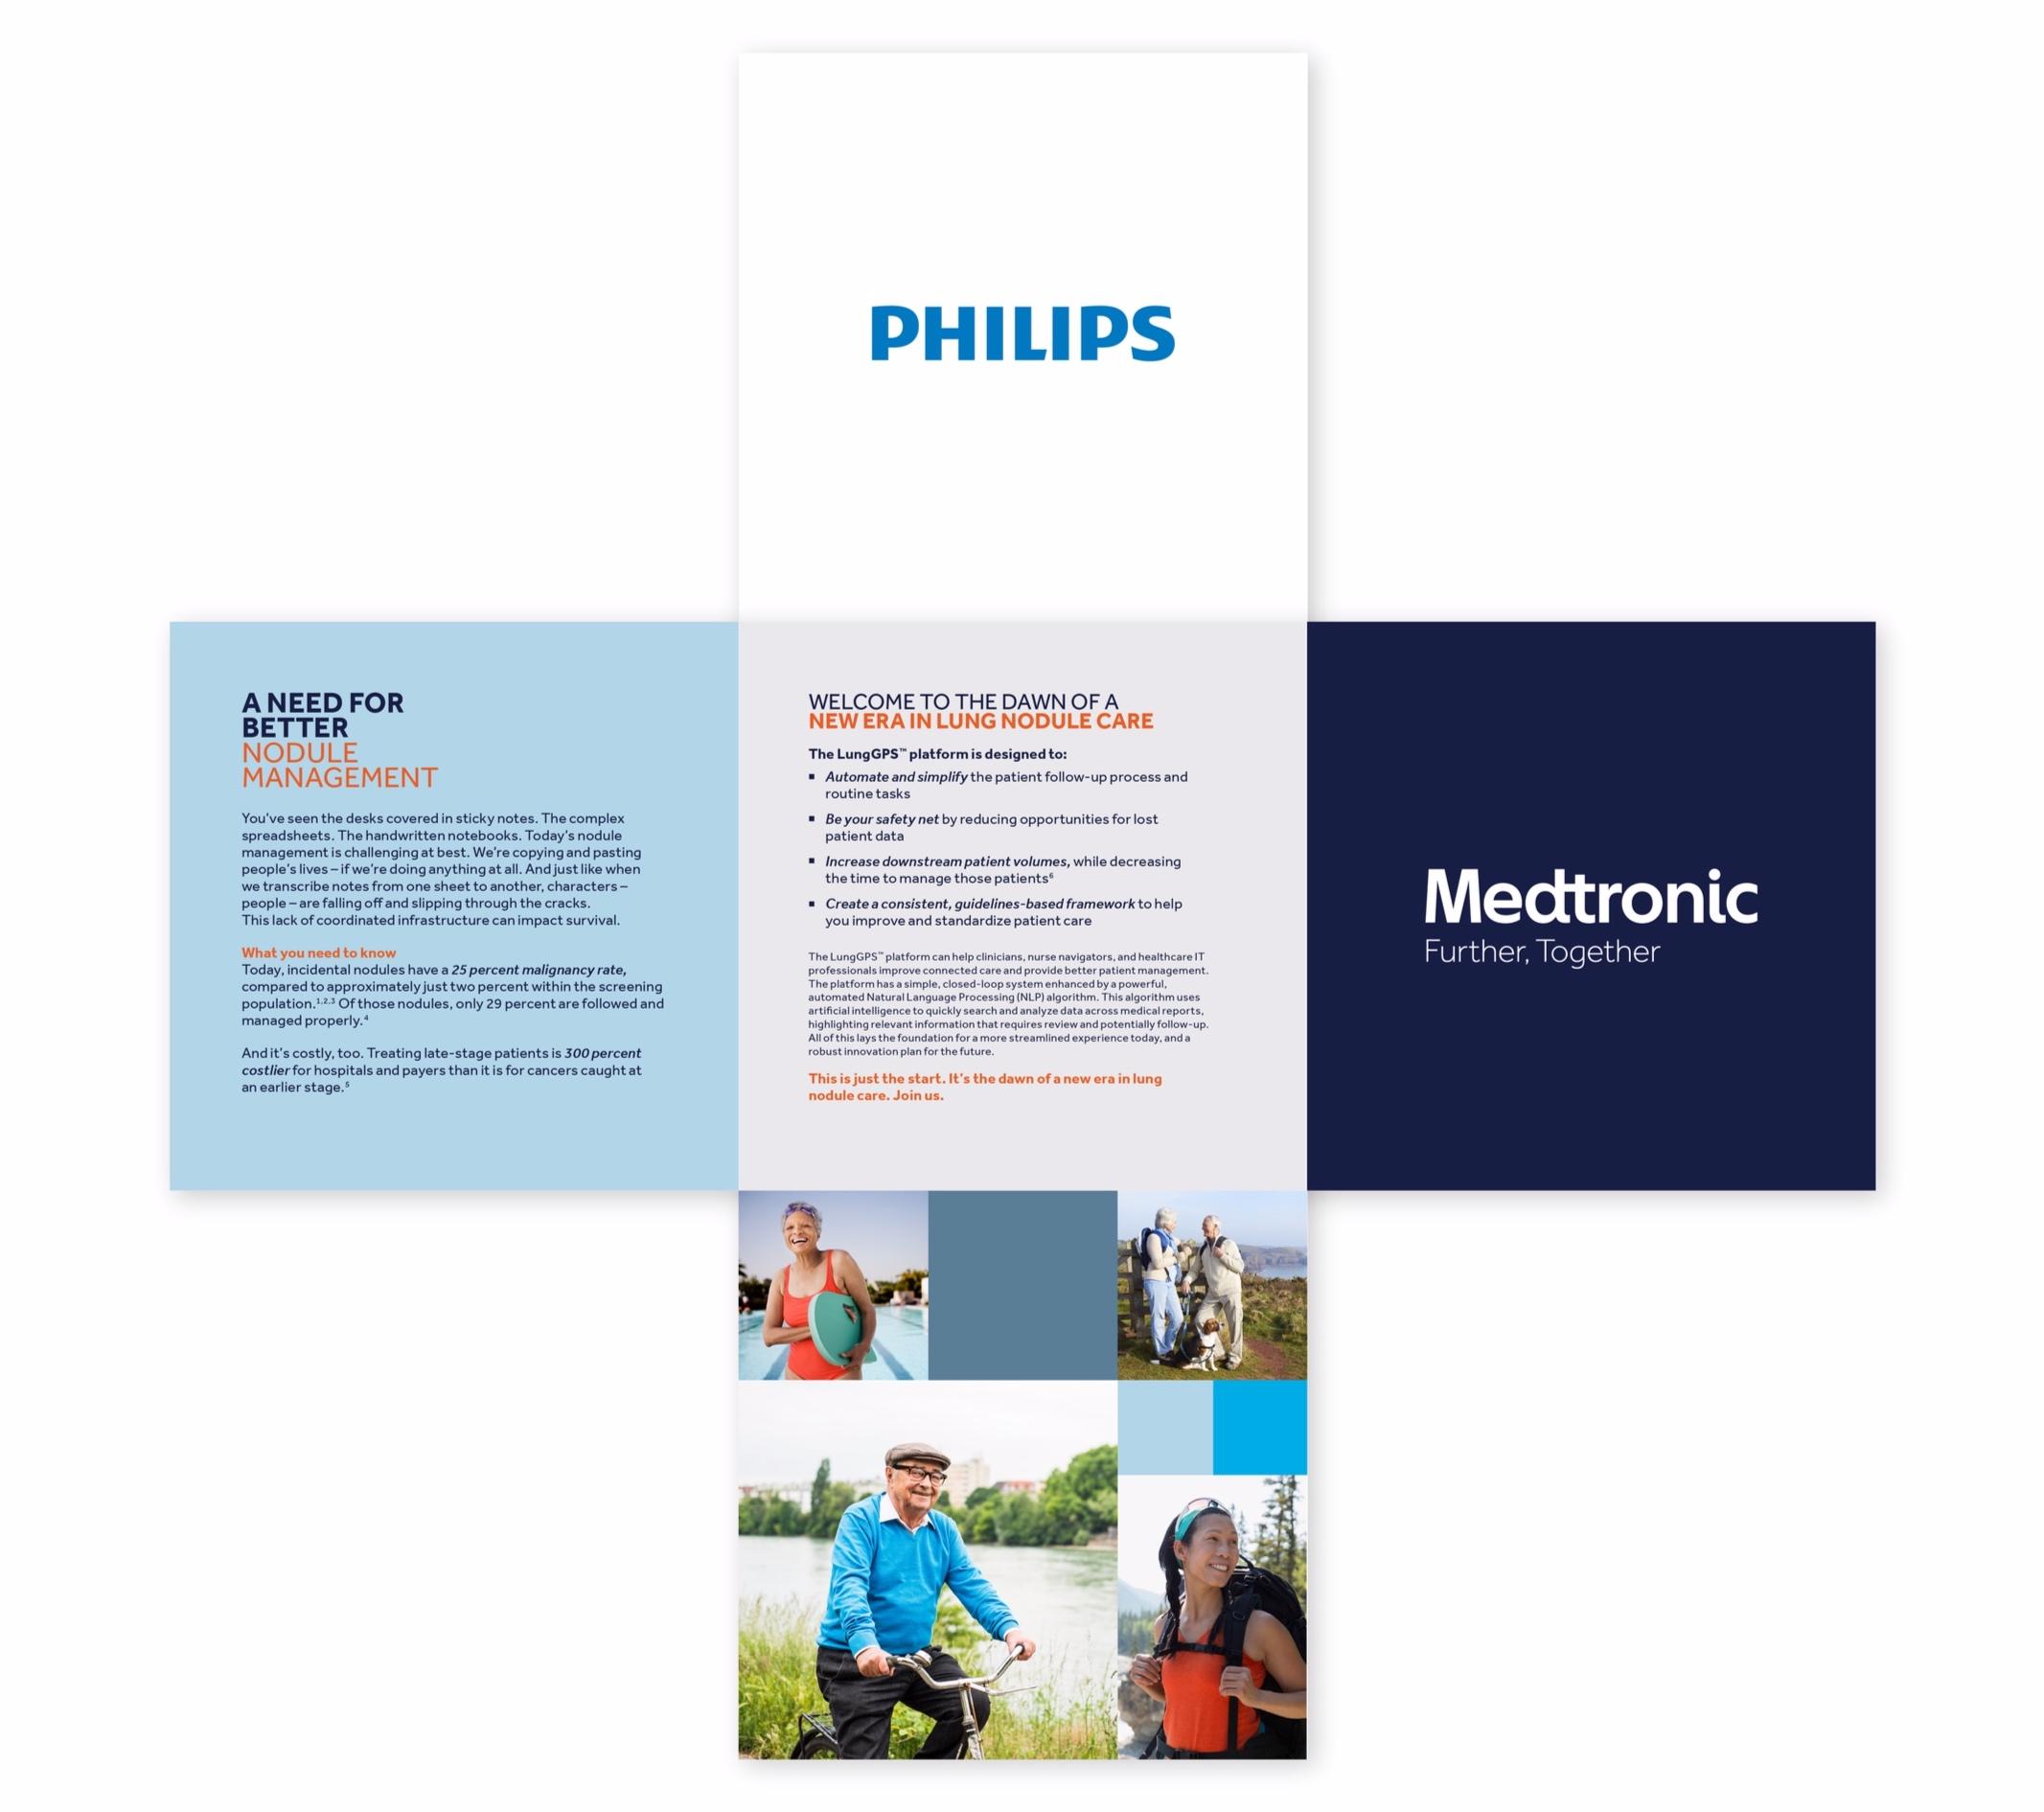 MTH1710_Philips_Invivo_Brochure_0502-02.png